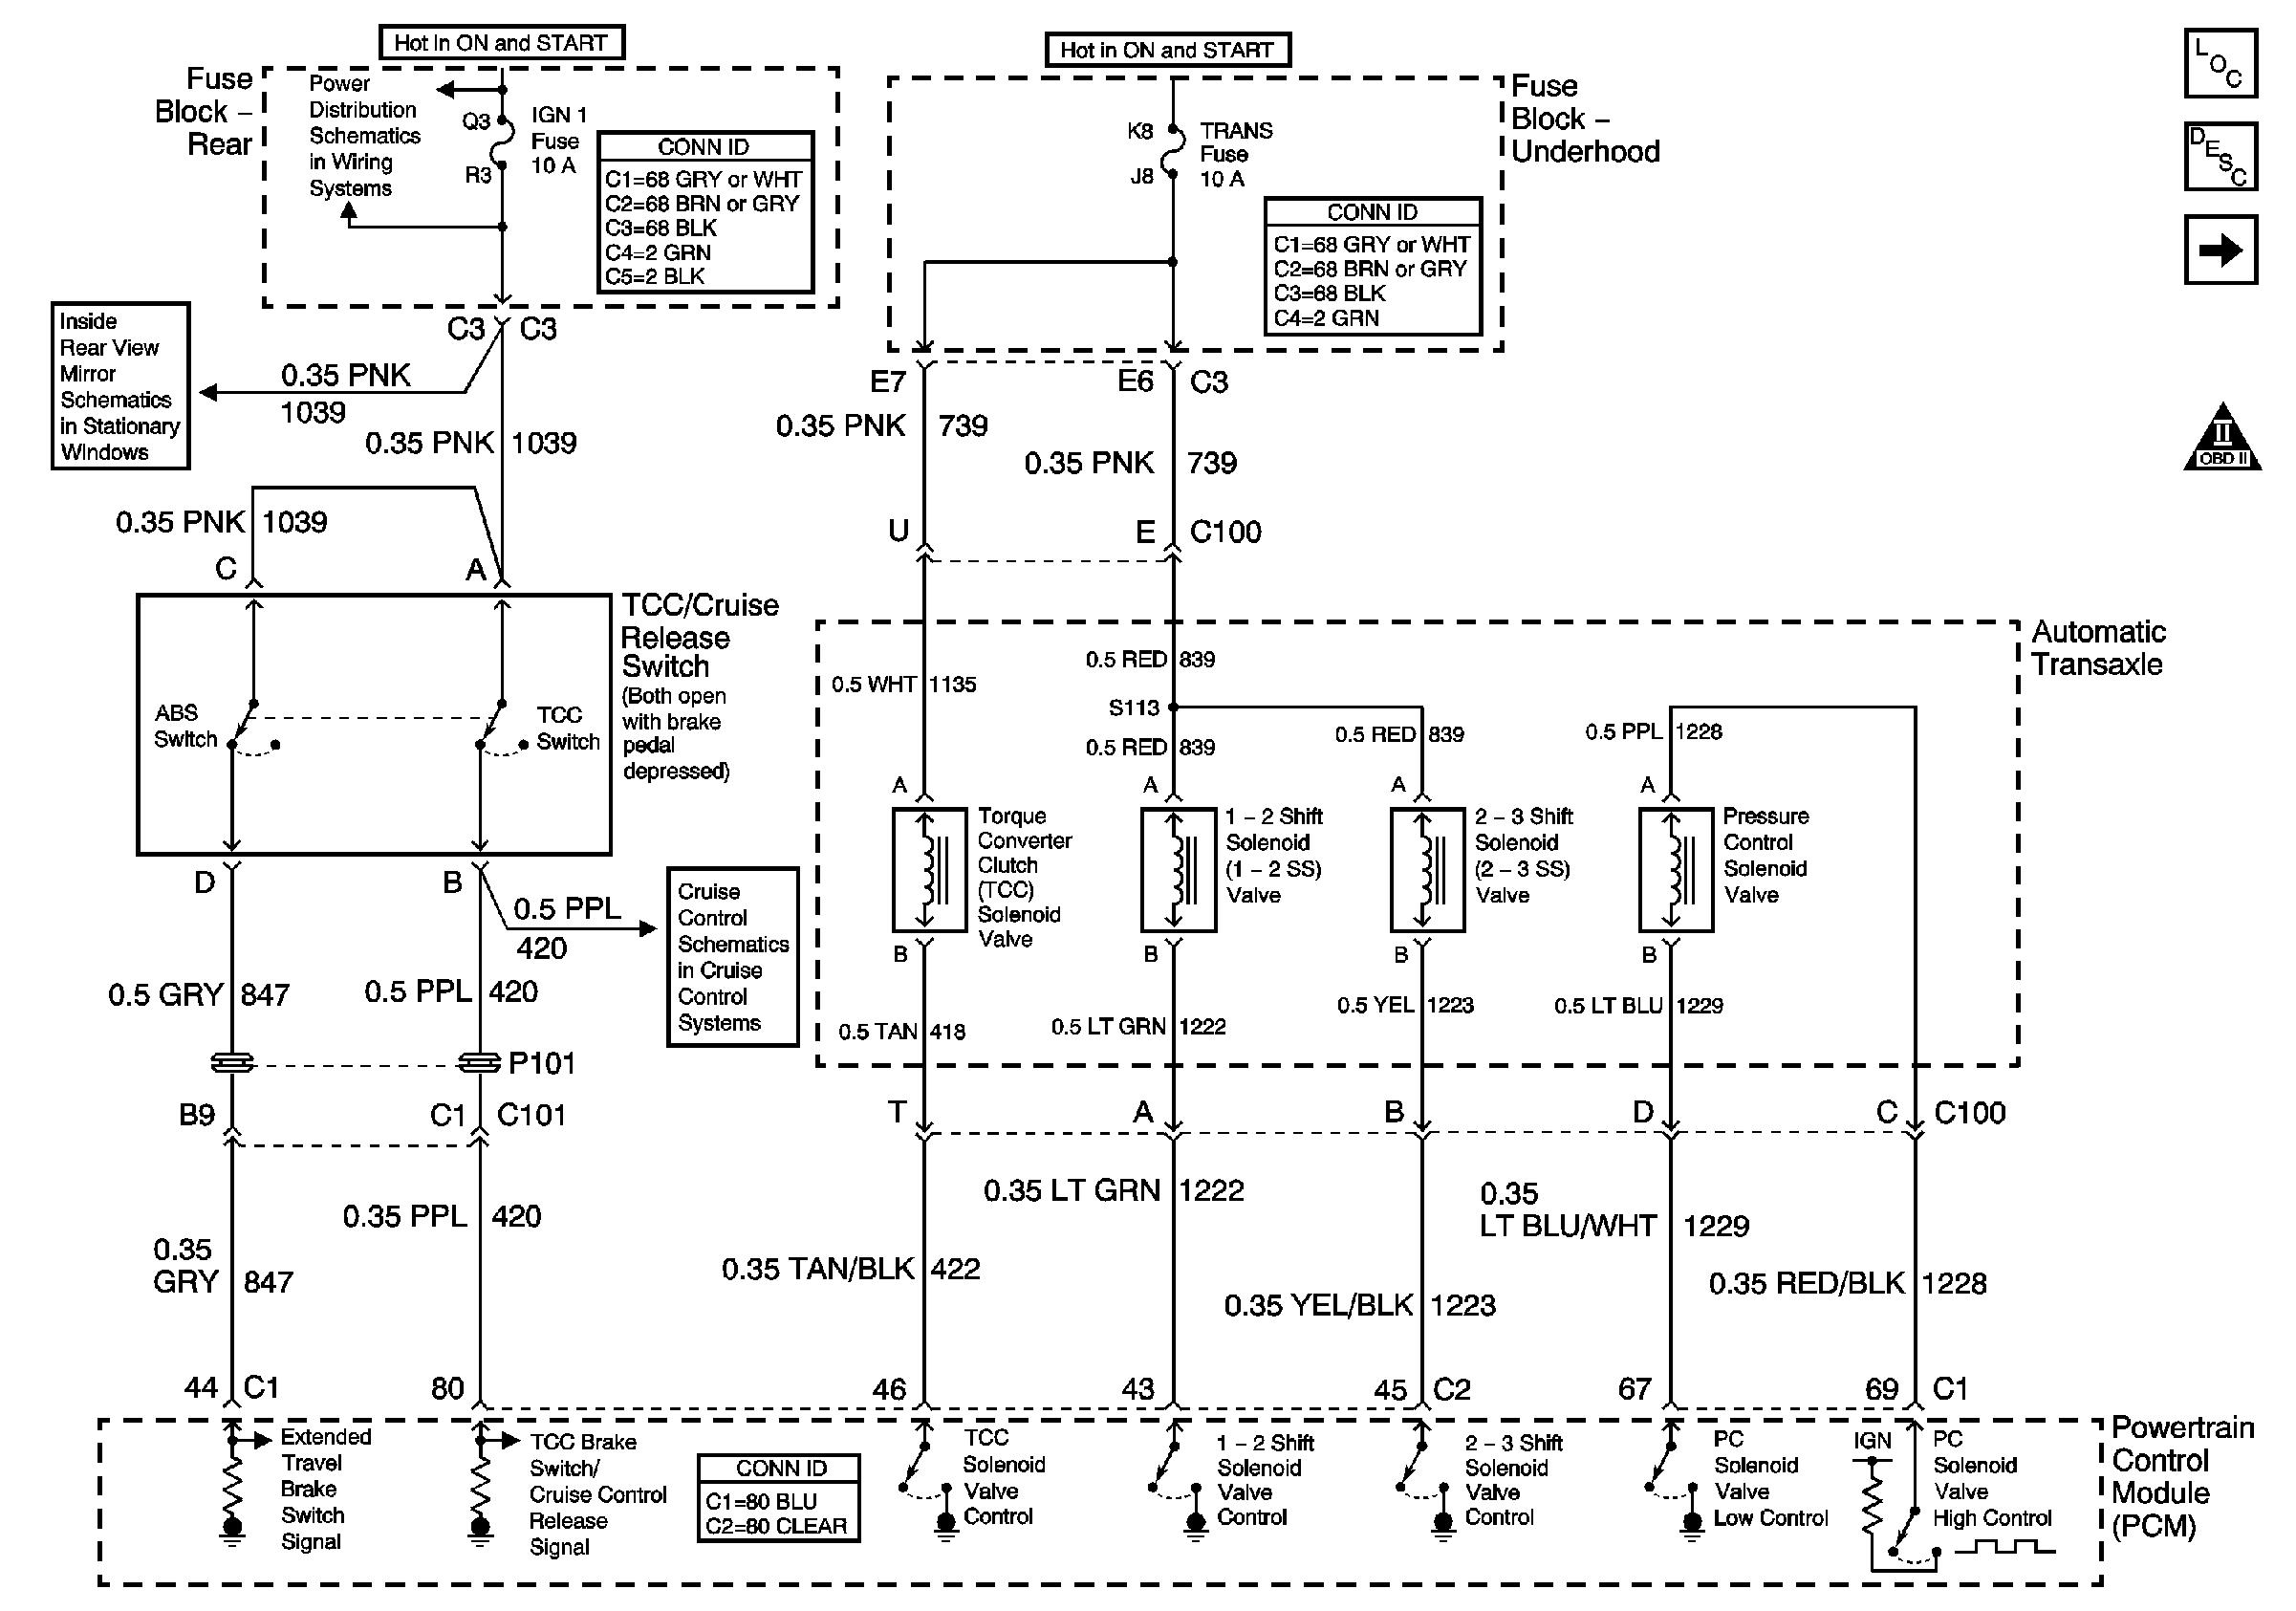 Phenomenal Cadillac Sts Engine Diagram Online Wiring Diagram Wiring Cloud Domeilariaidewilluminateatxorg